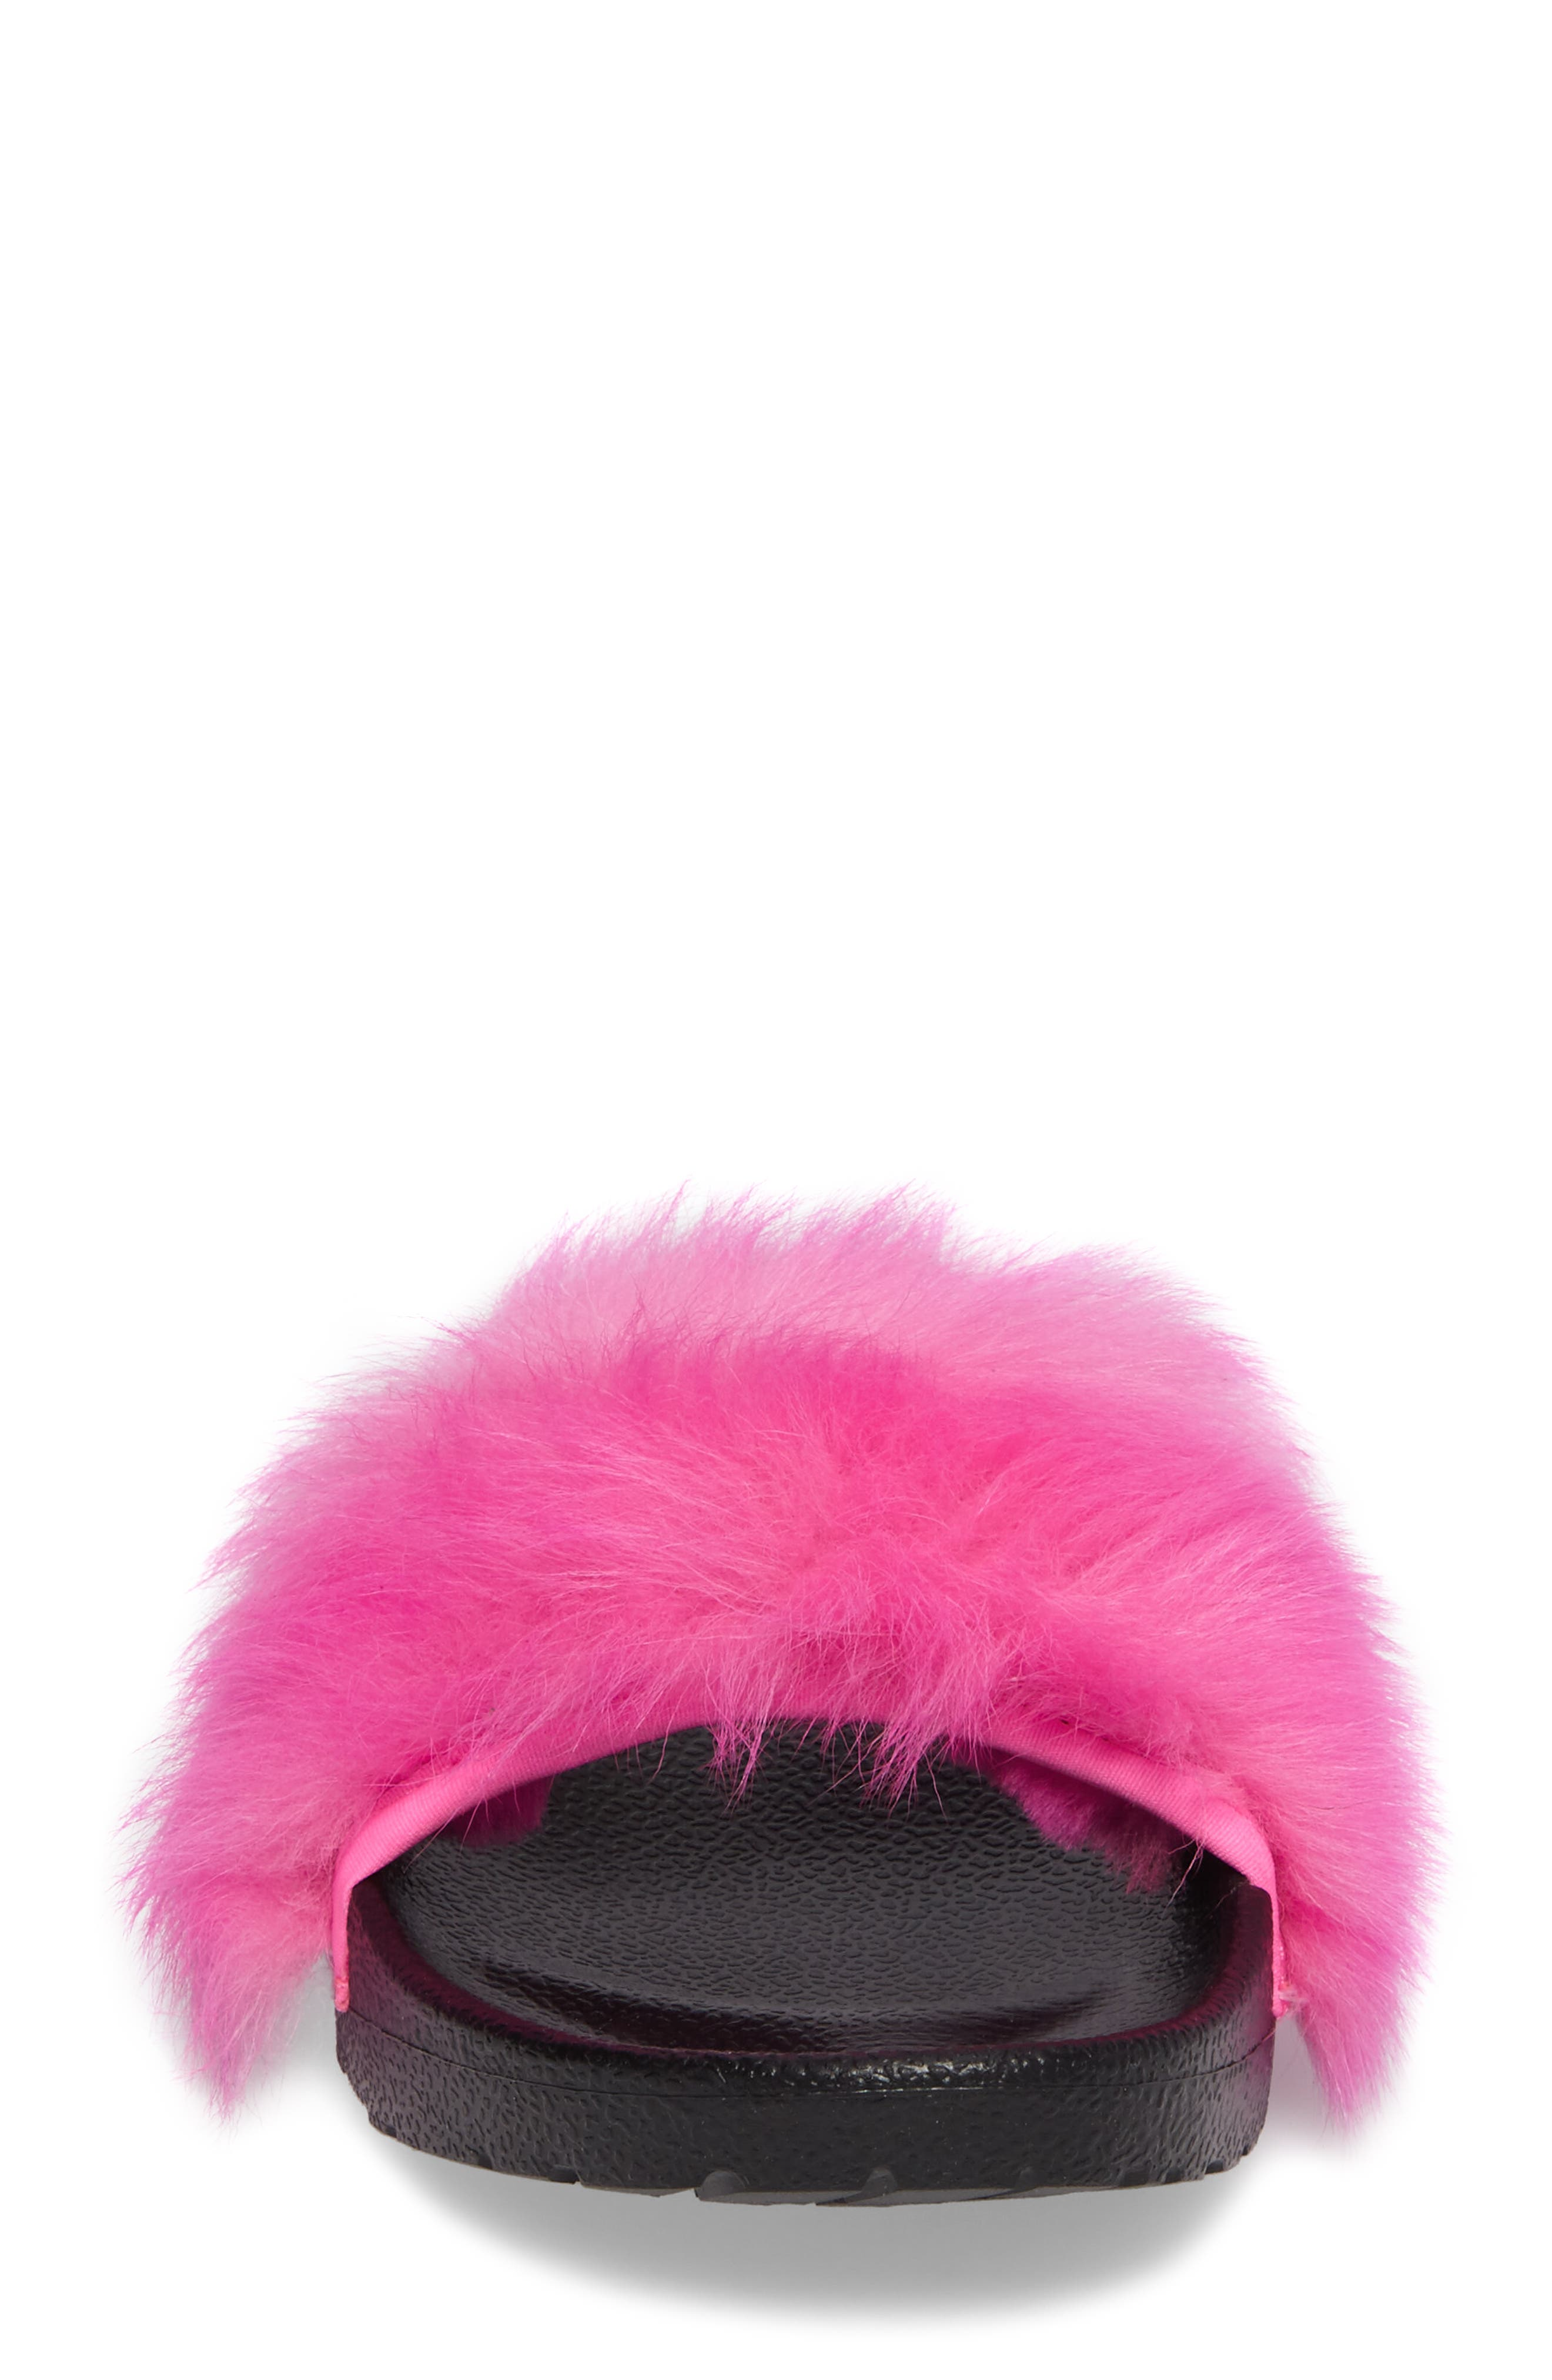 Royale Genuine Shearling Slide Sandal,                             Alternate thumbnail 5, color,                             Neon Pink